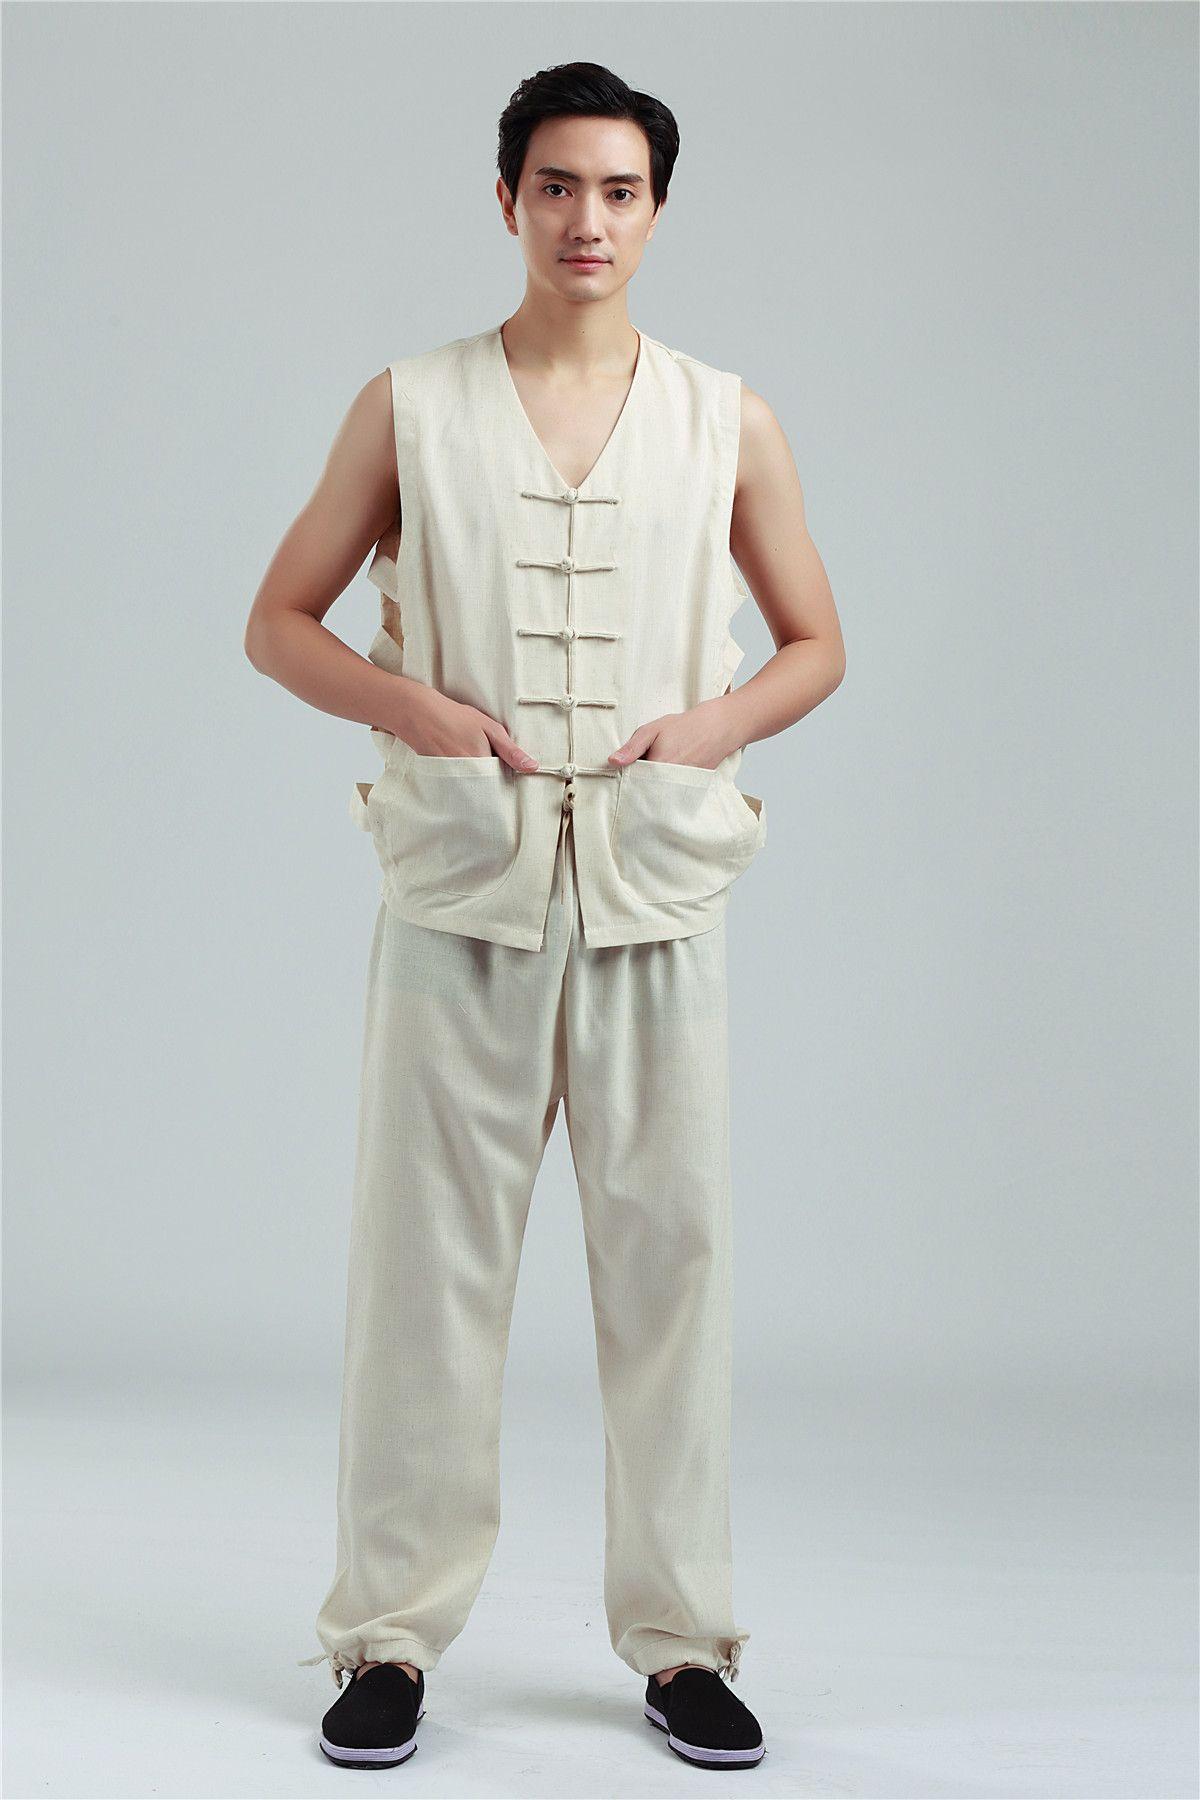 Shanghai Story Chinese tang suit sleeveless Vest Clothing Set linen vest summer men's national costume kung fu uniform